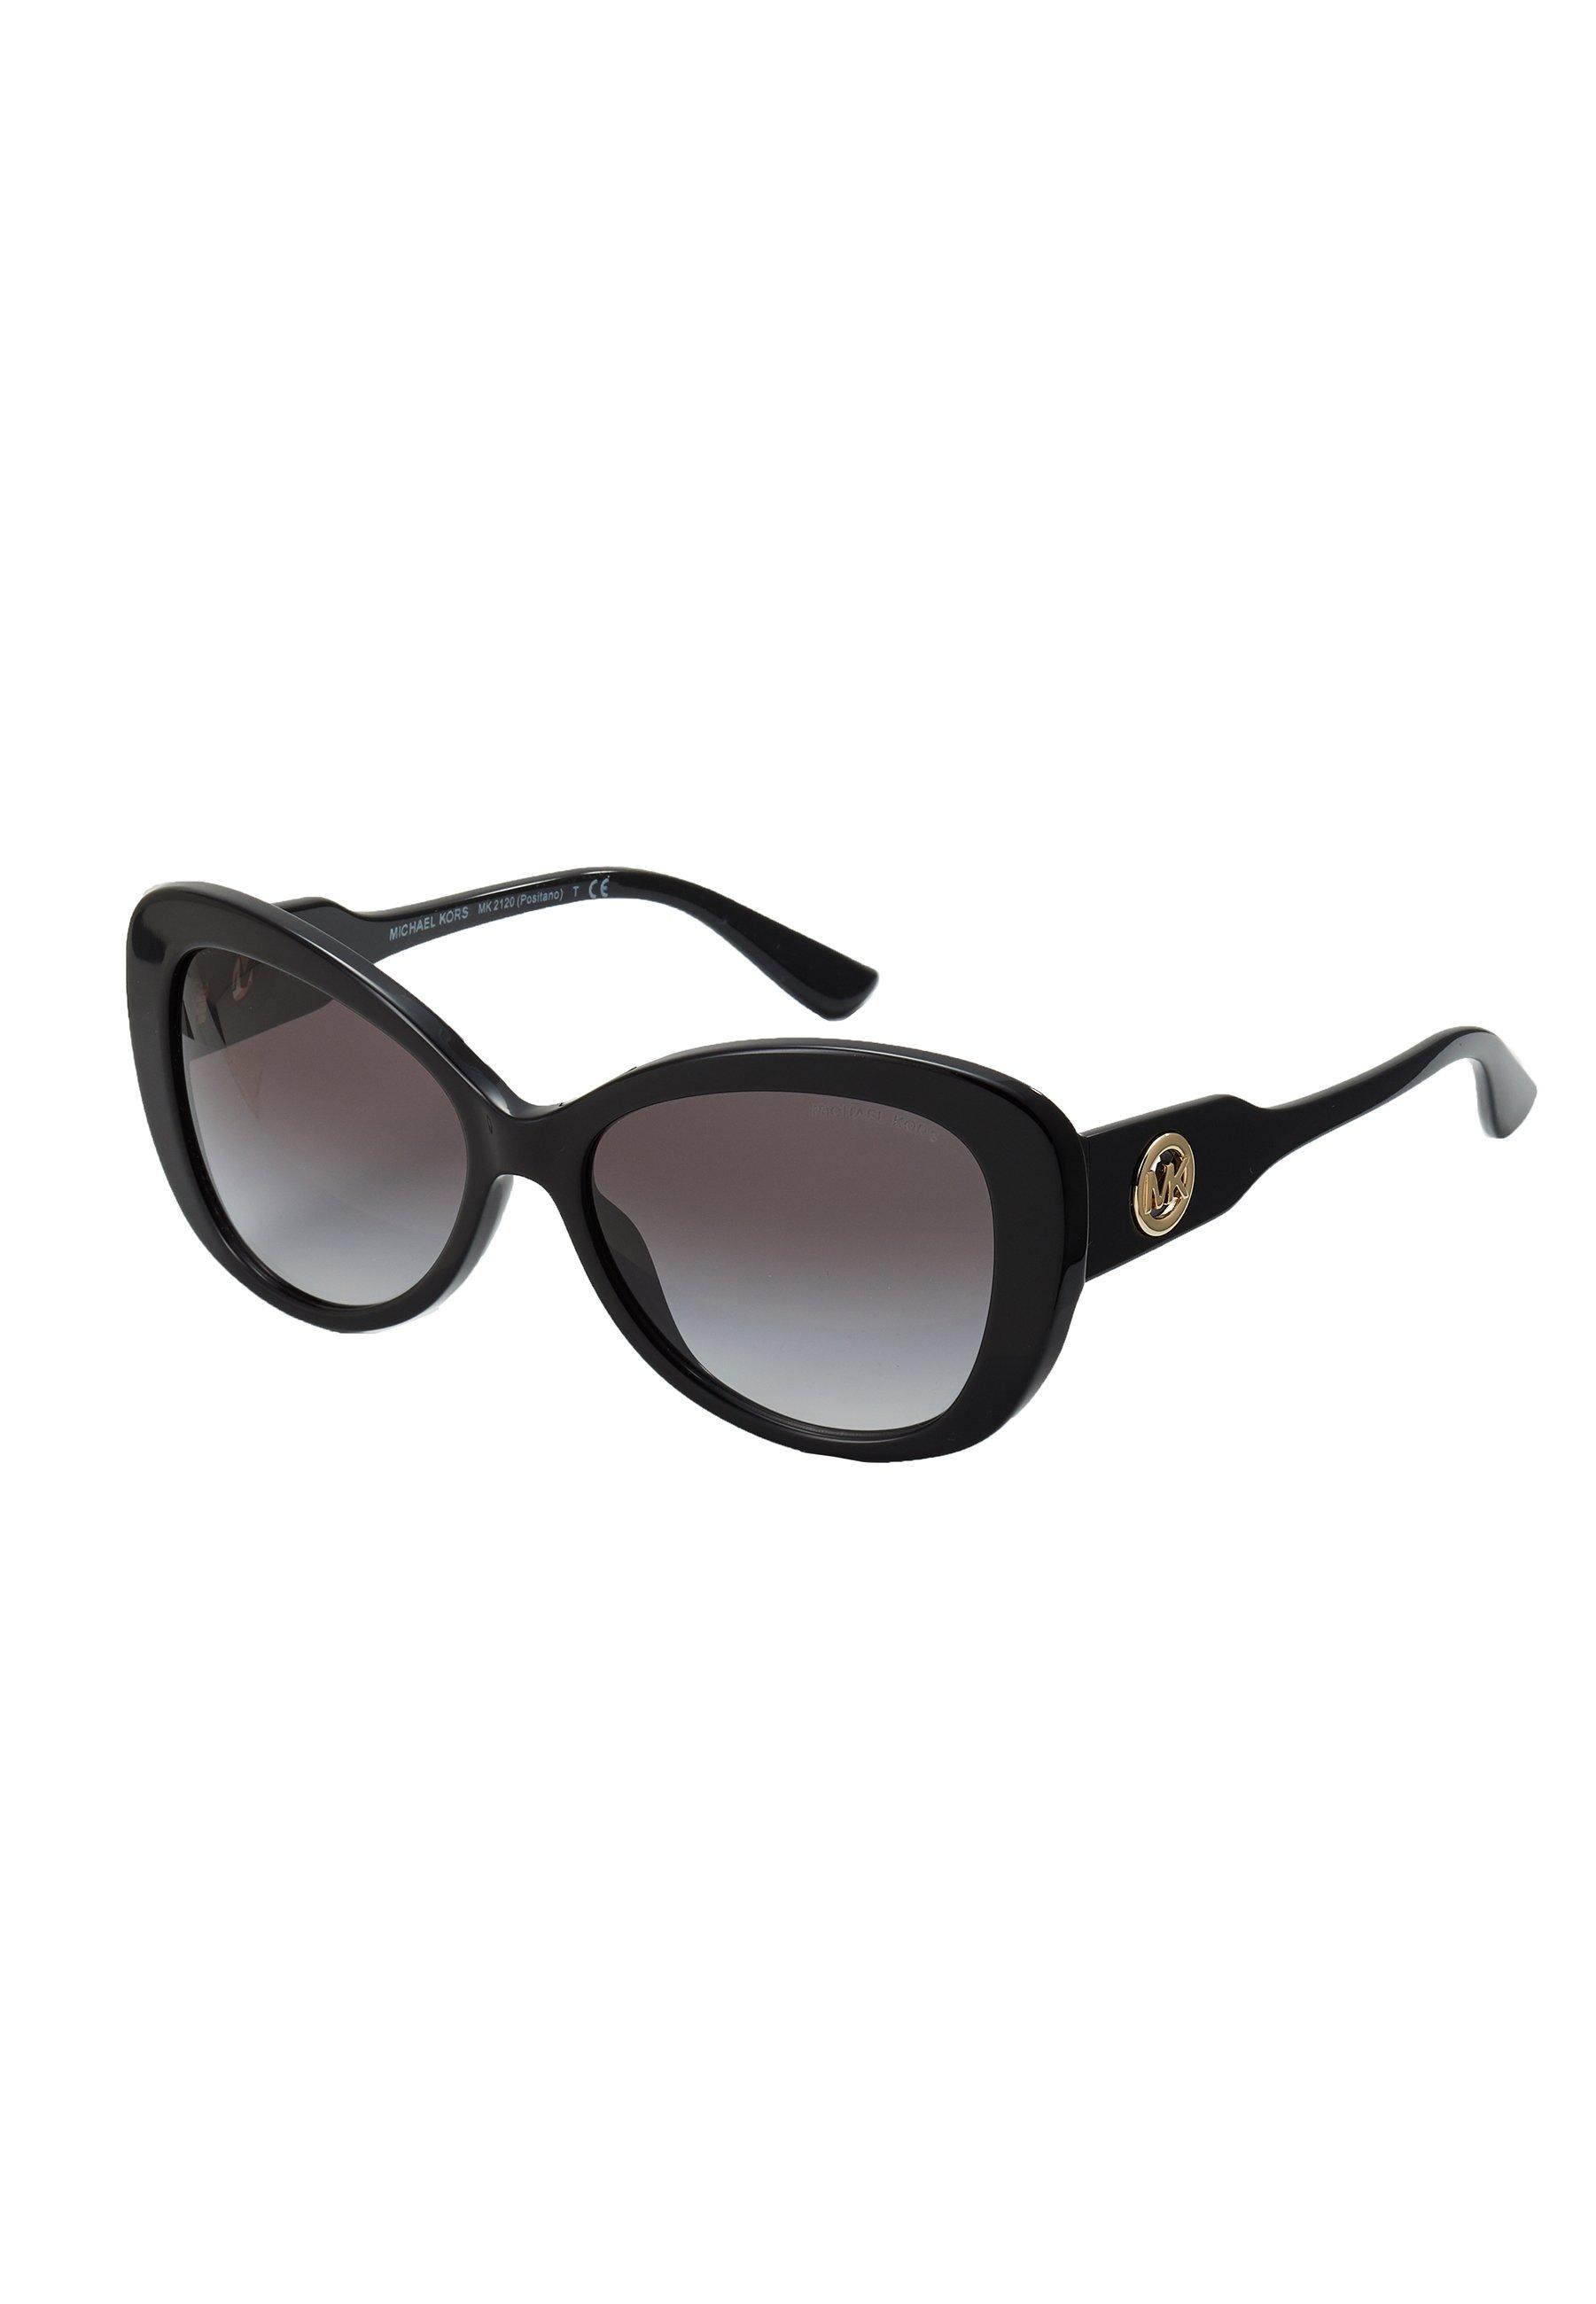 Michael Kors Solbriller - black/svart RKpSzhANEZTzGgh